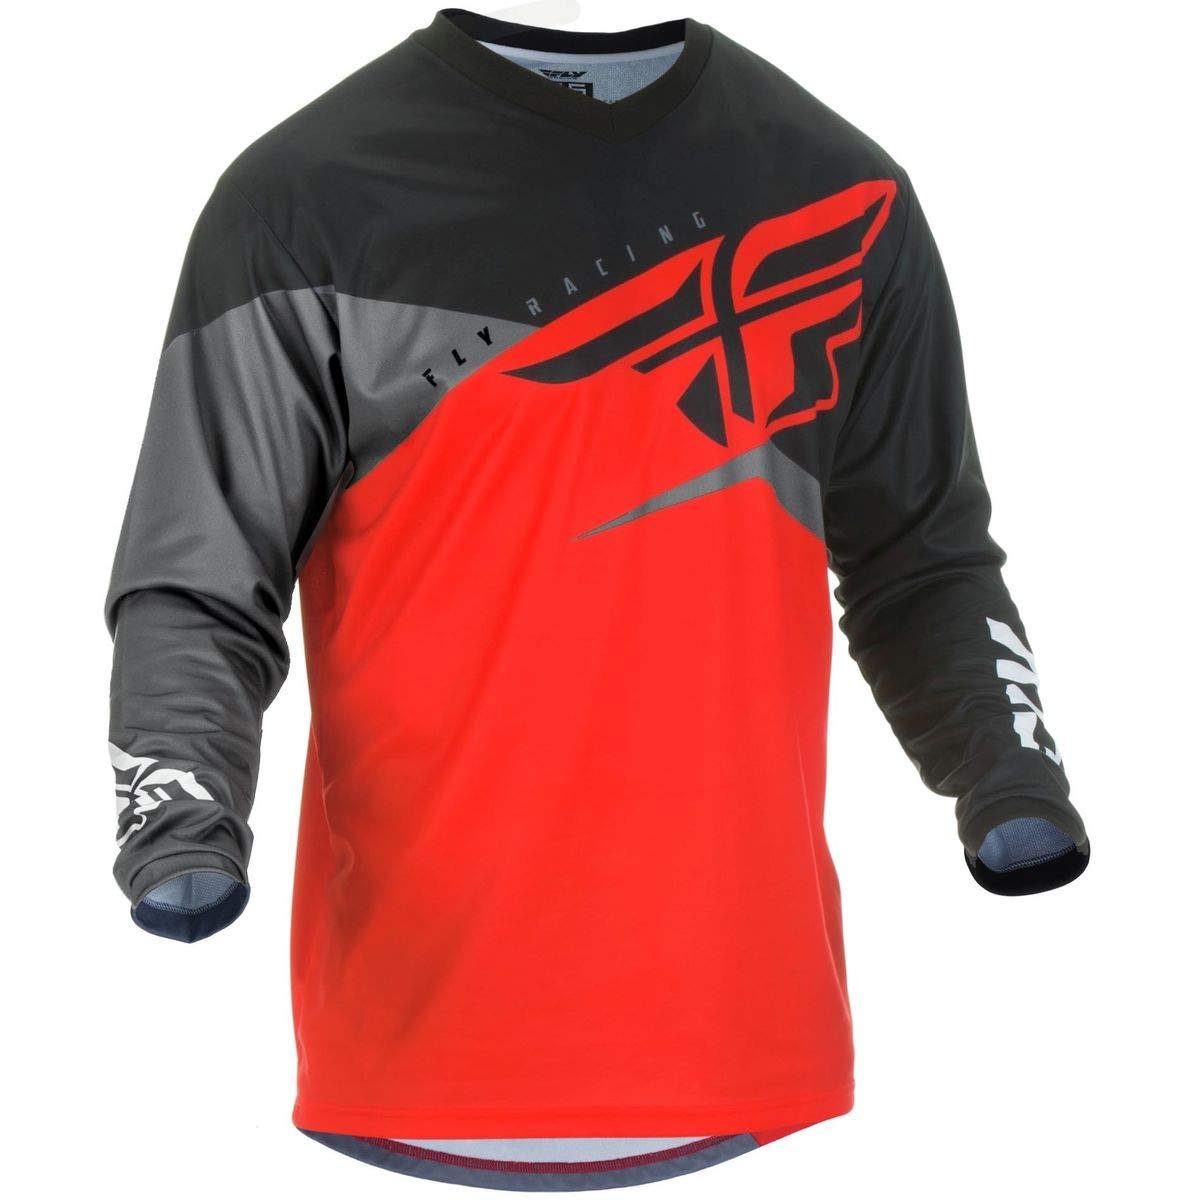 Camiseta Fly Racing 2019 F-16